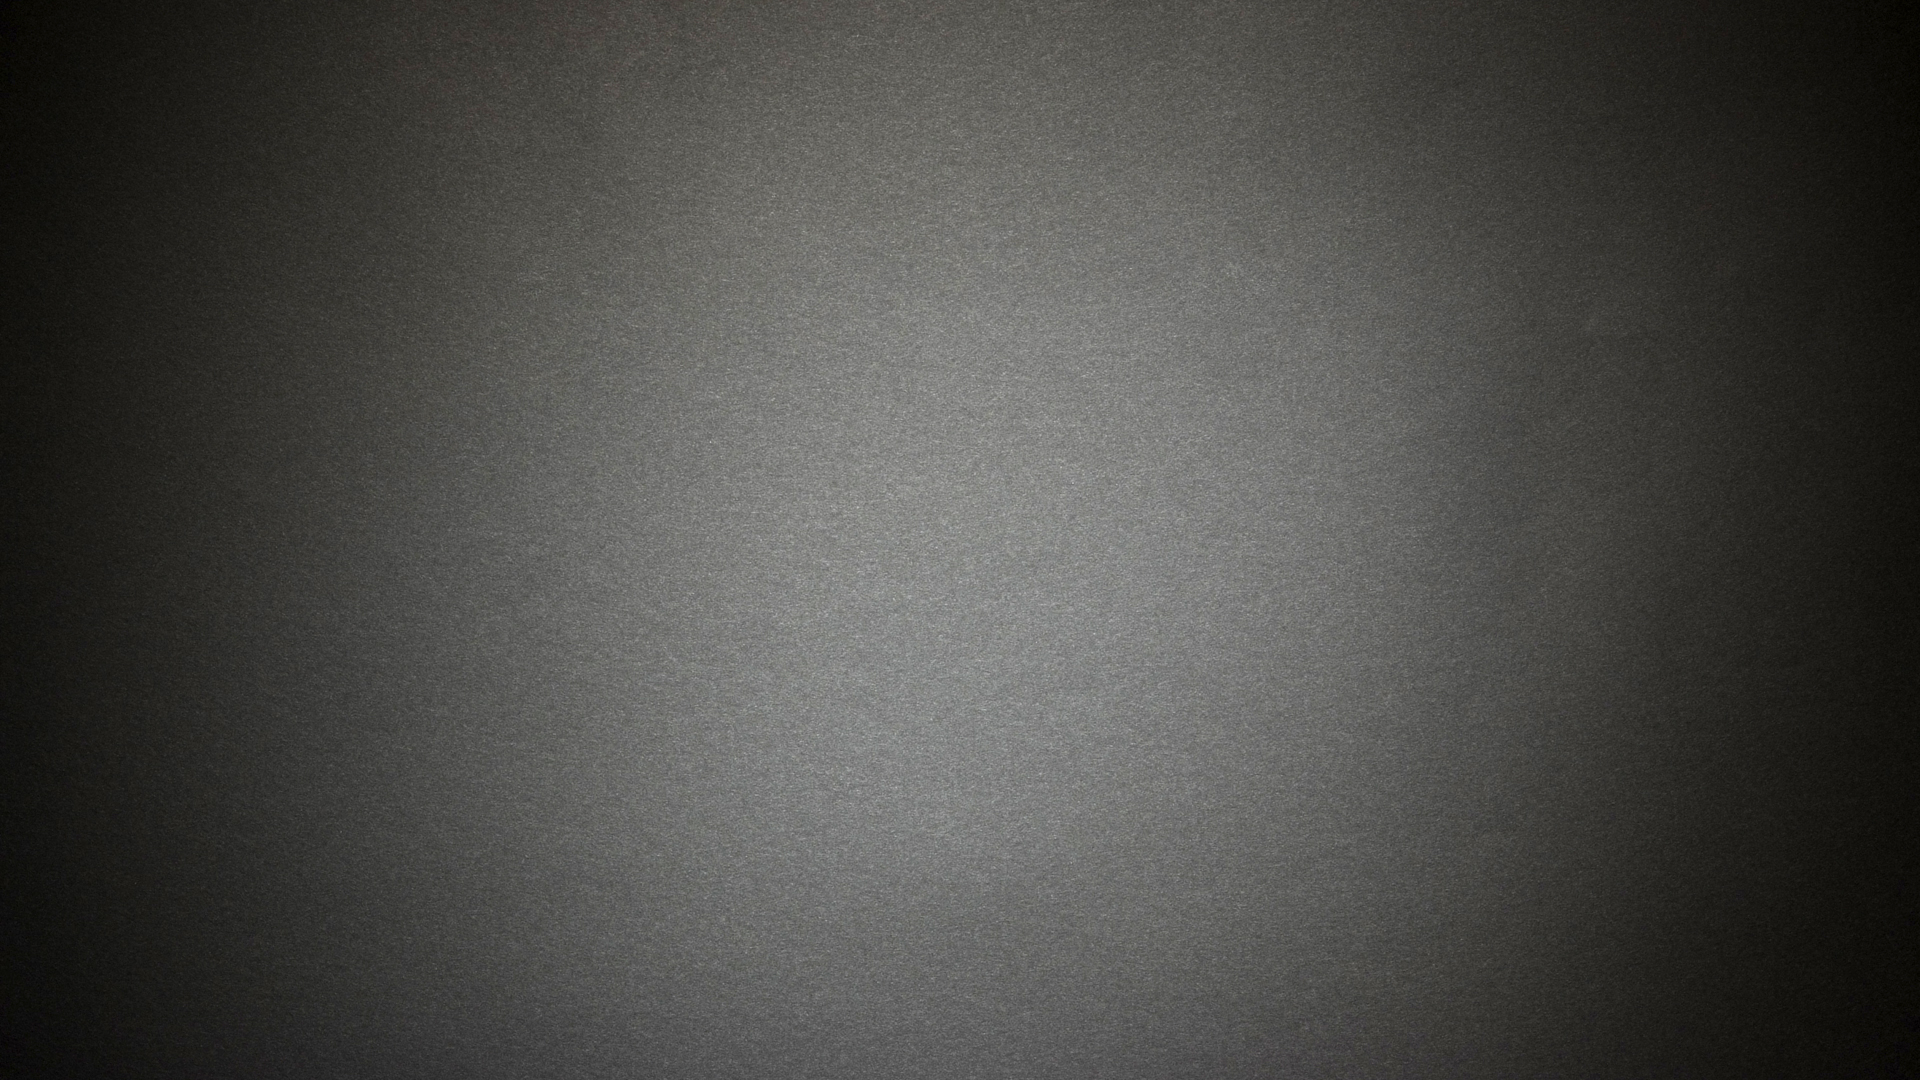 Free Wallpaper For Website Background Wallpaperwebsites